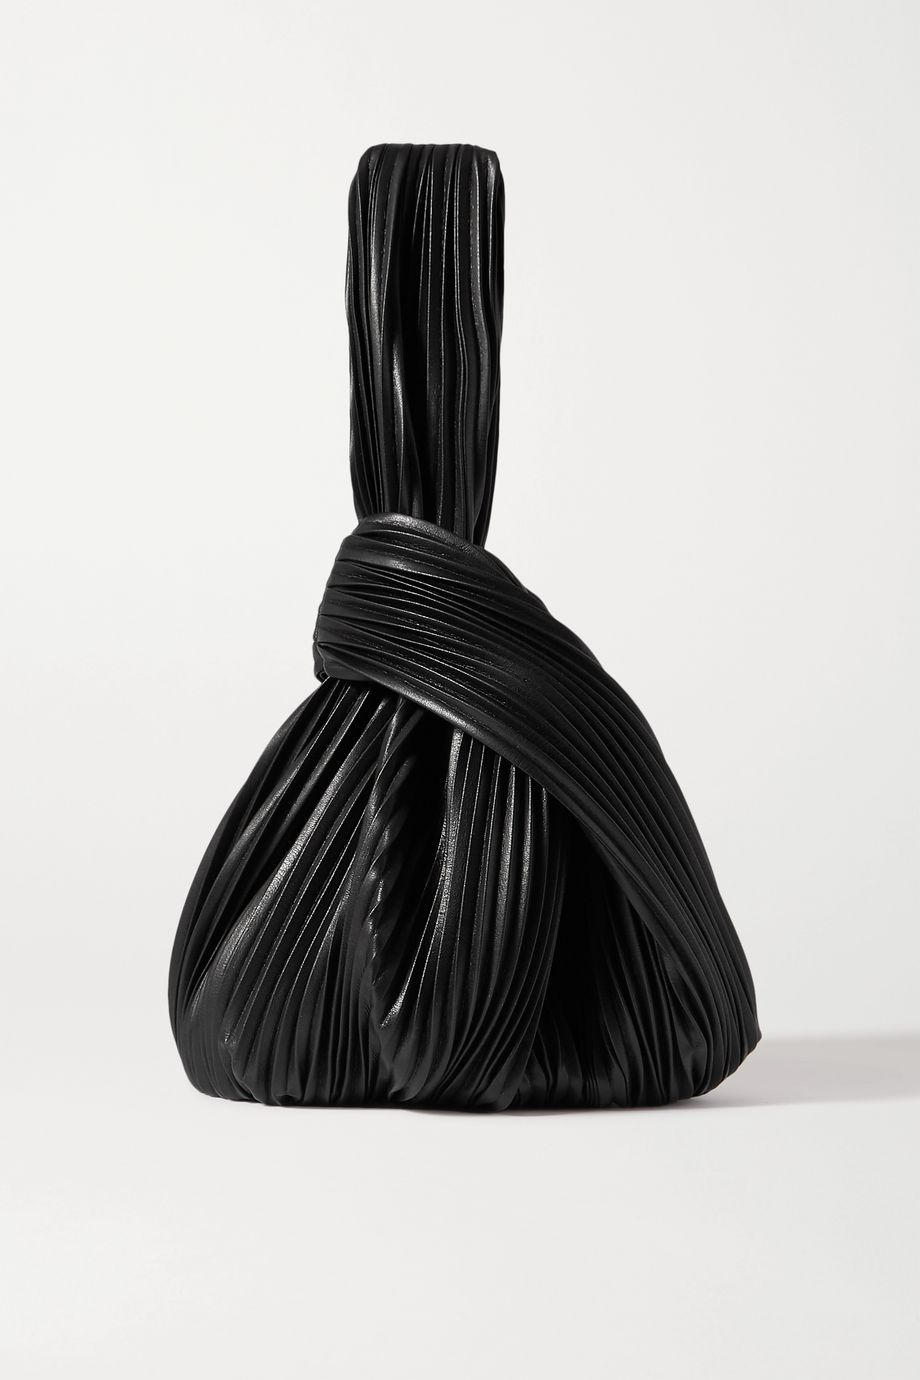 Nanushka Jen Tote aus veganem Leder mit Plissee und Knoten